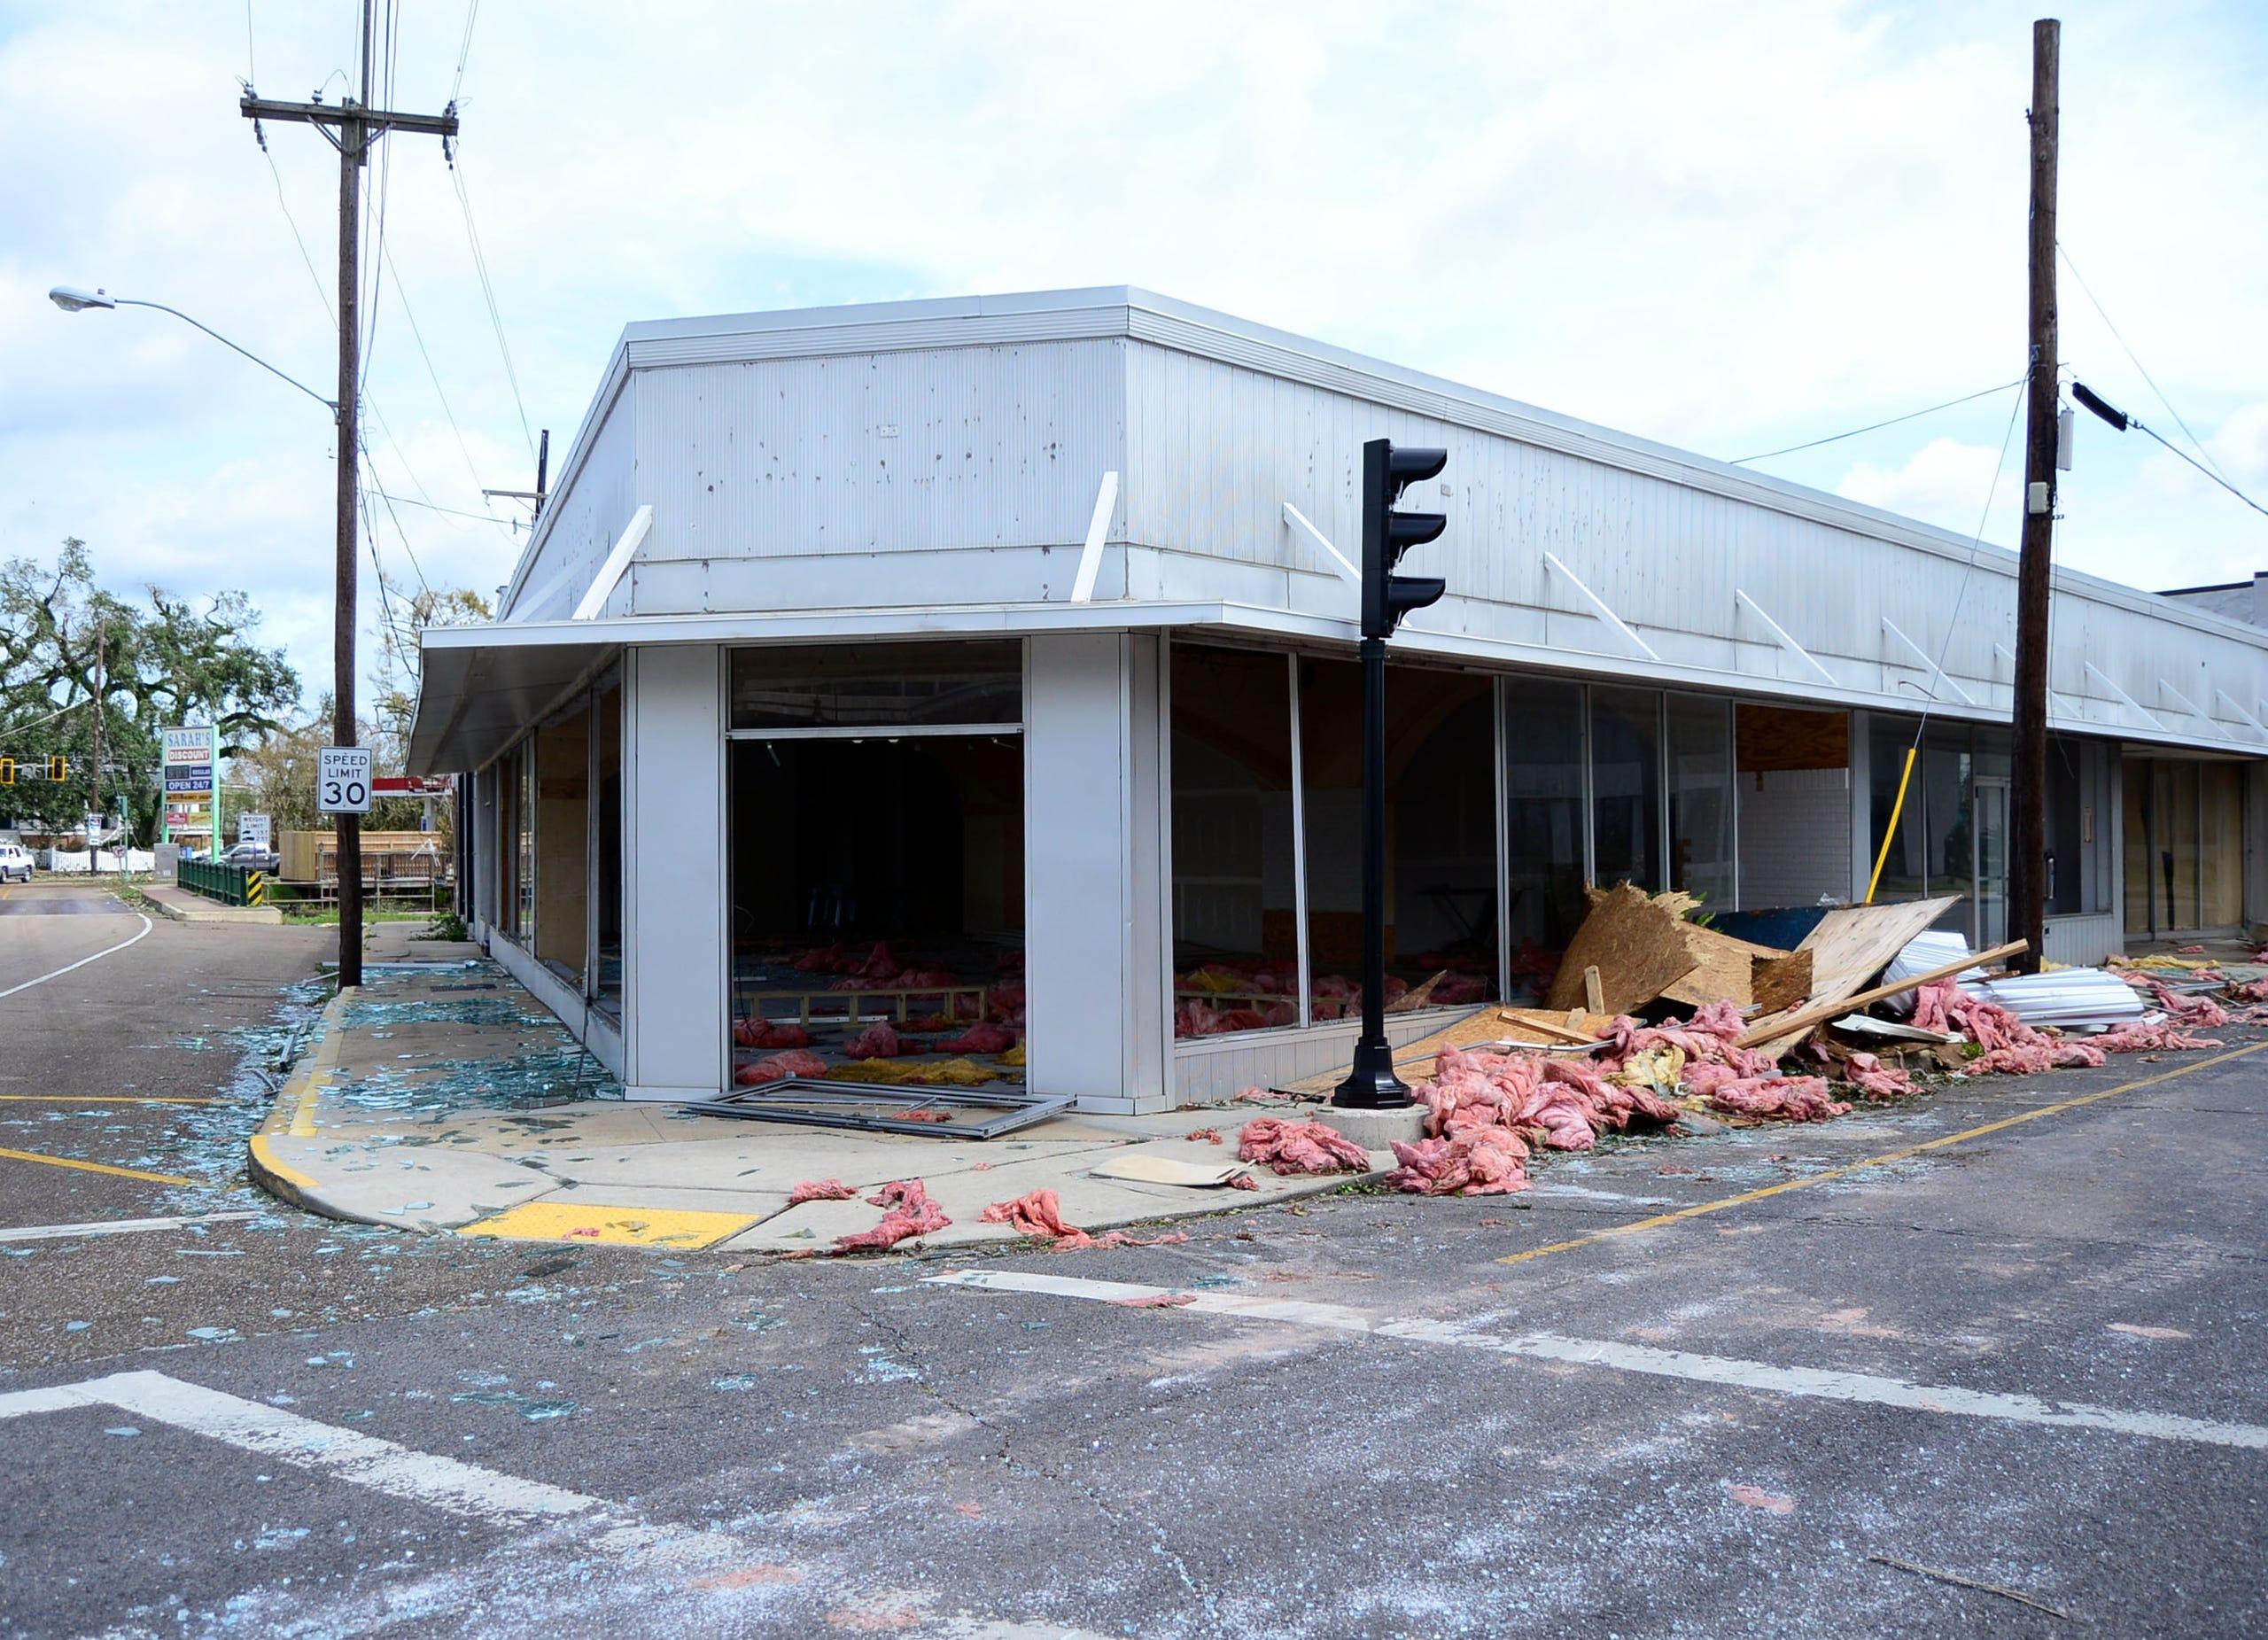 A building near the Houma downtown area was damaged during Hurricane Ida.